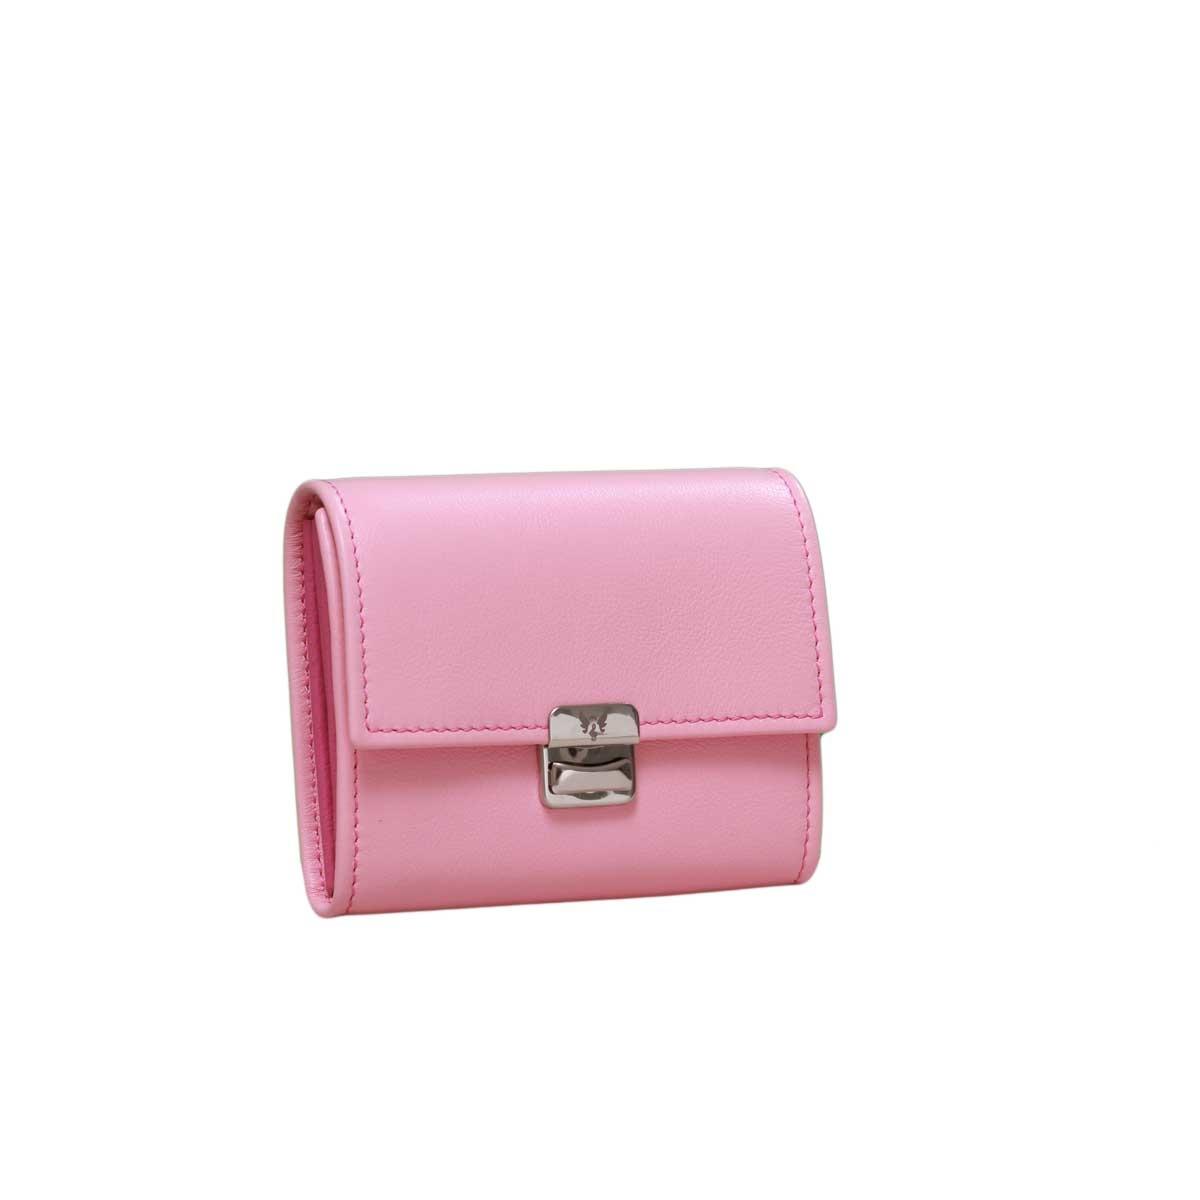 süße rosa geldbörsen leer handgemacht